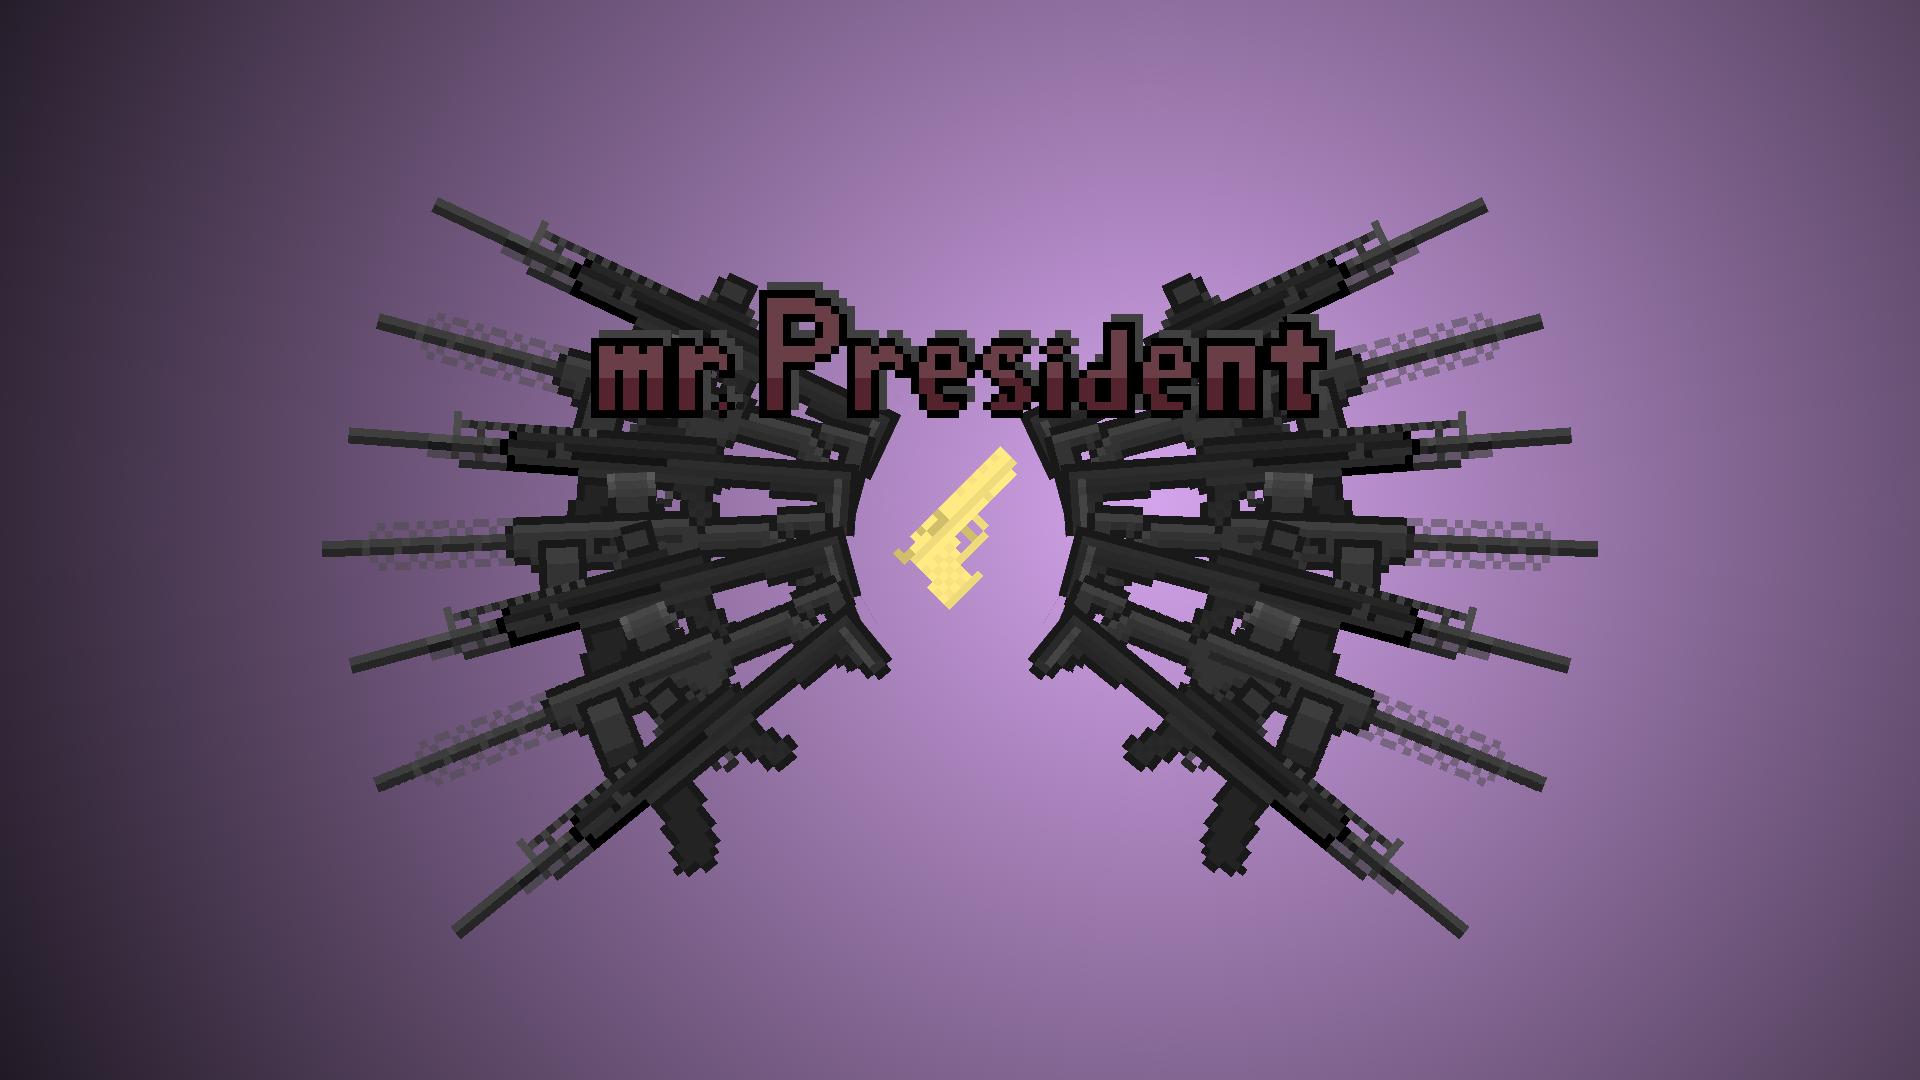 Mr president играть онлайн 3d - a450